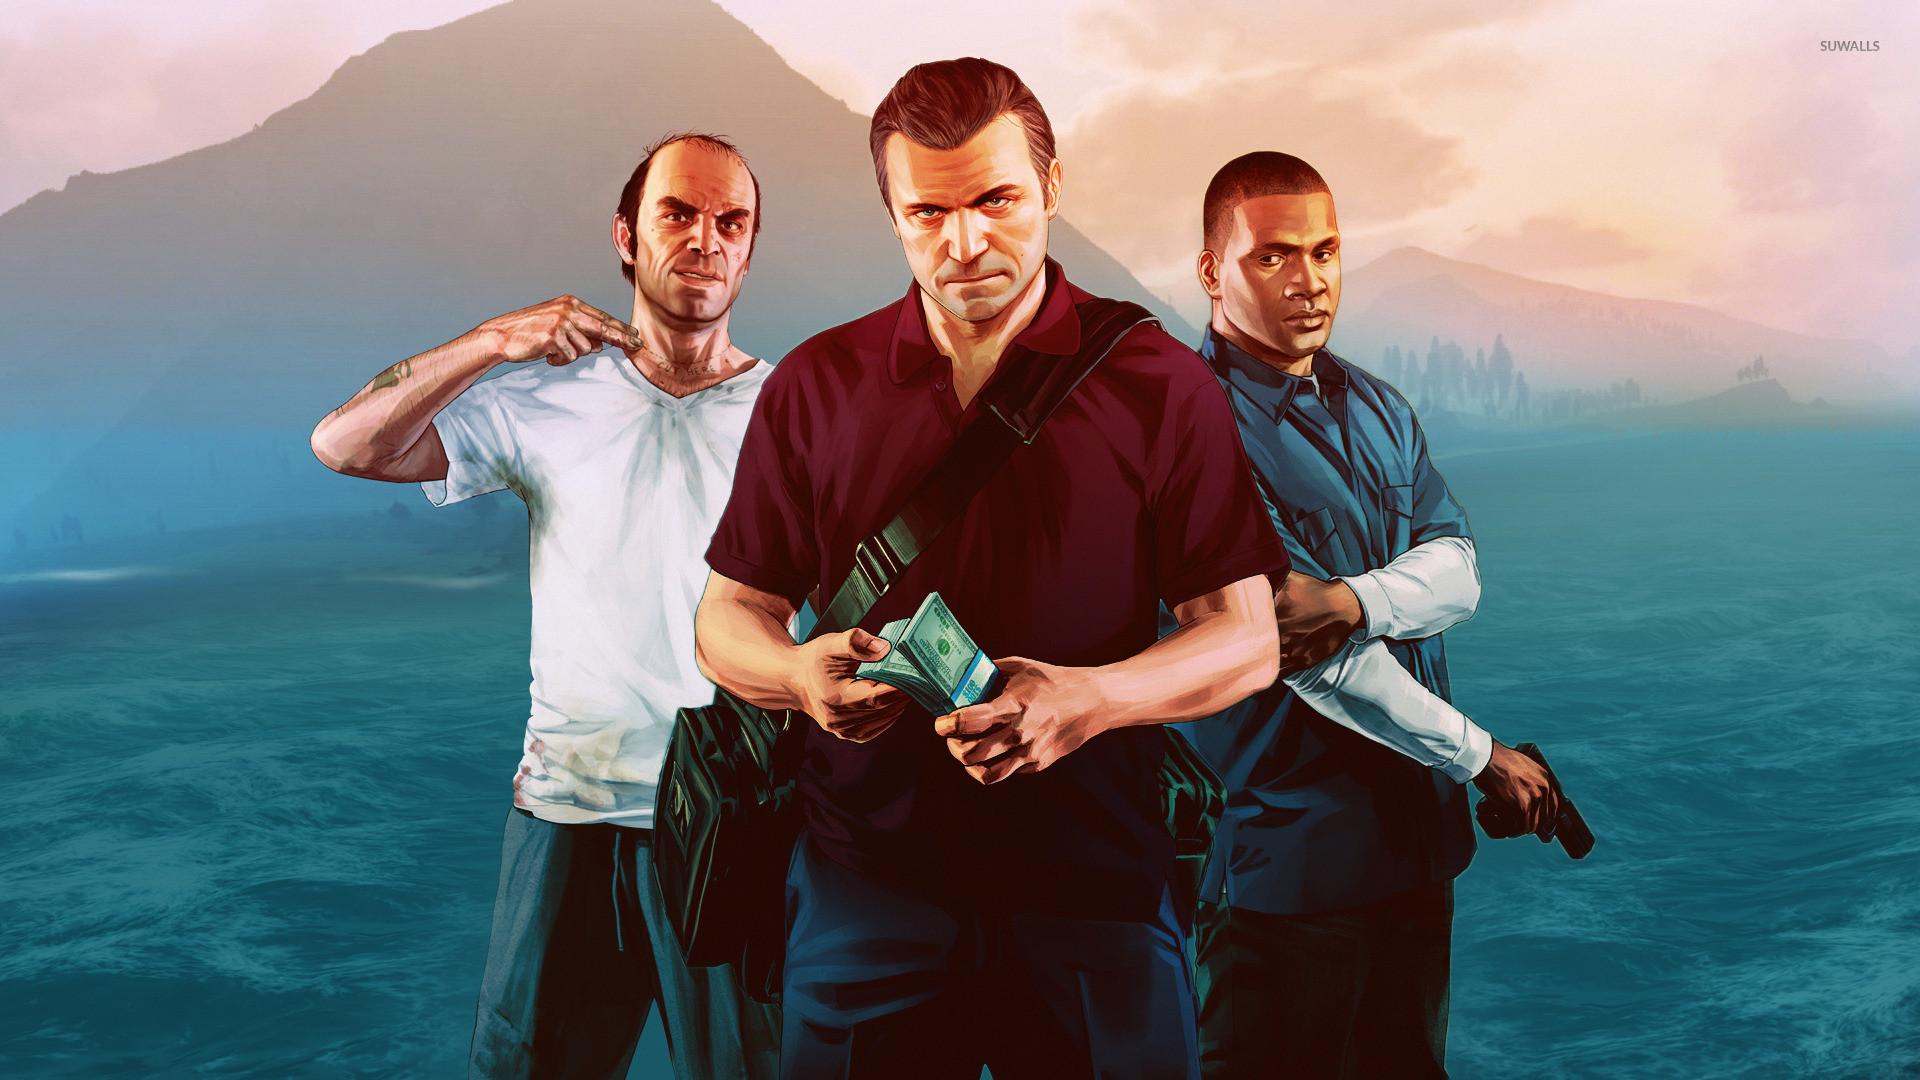 Trevor, Michael and Franklin – Grand Theft Auto V wallpaper jpg